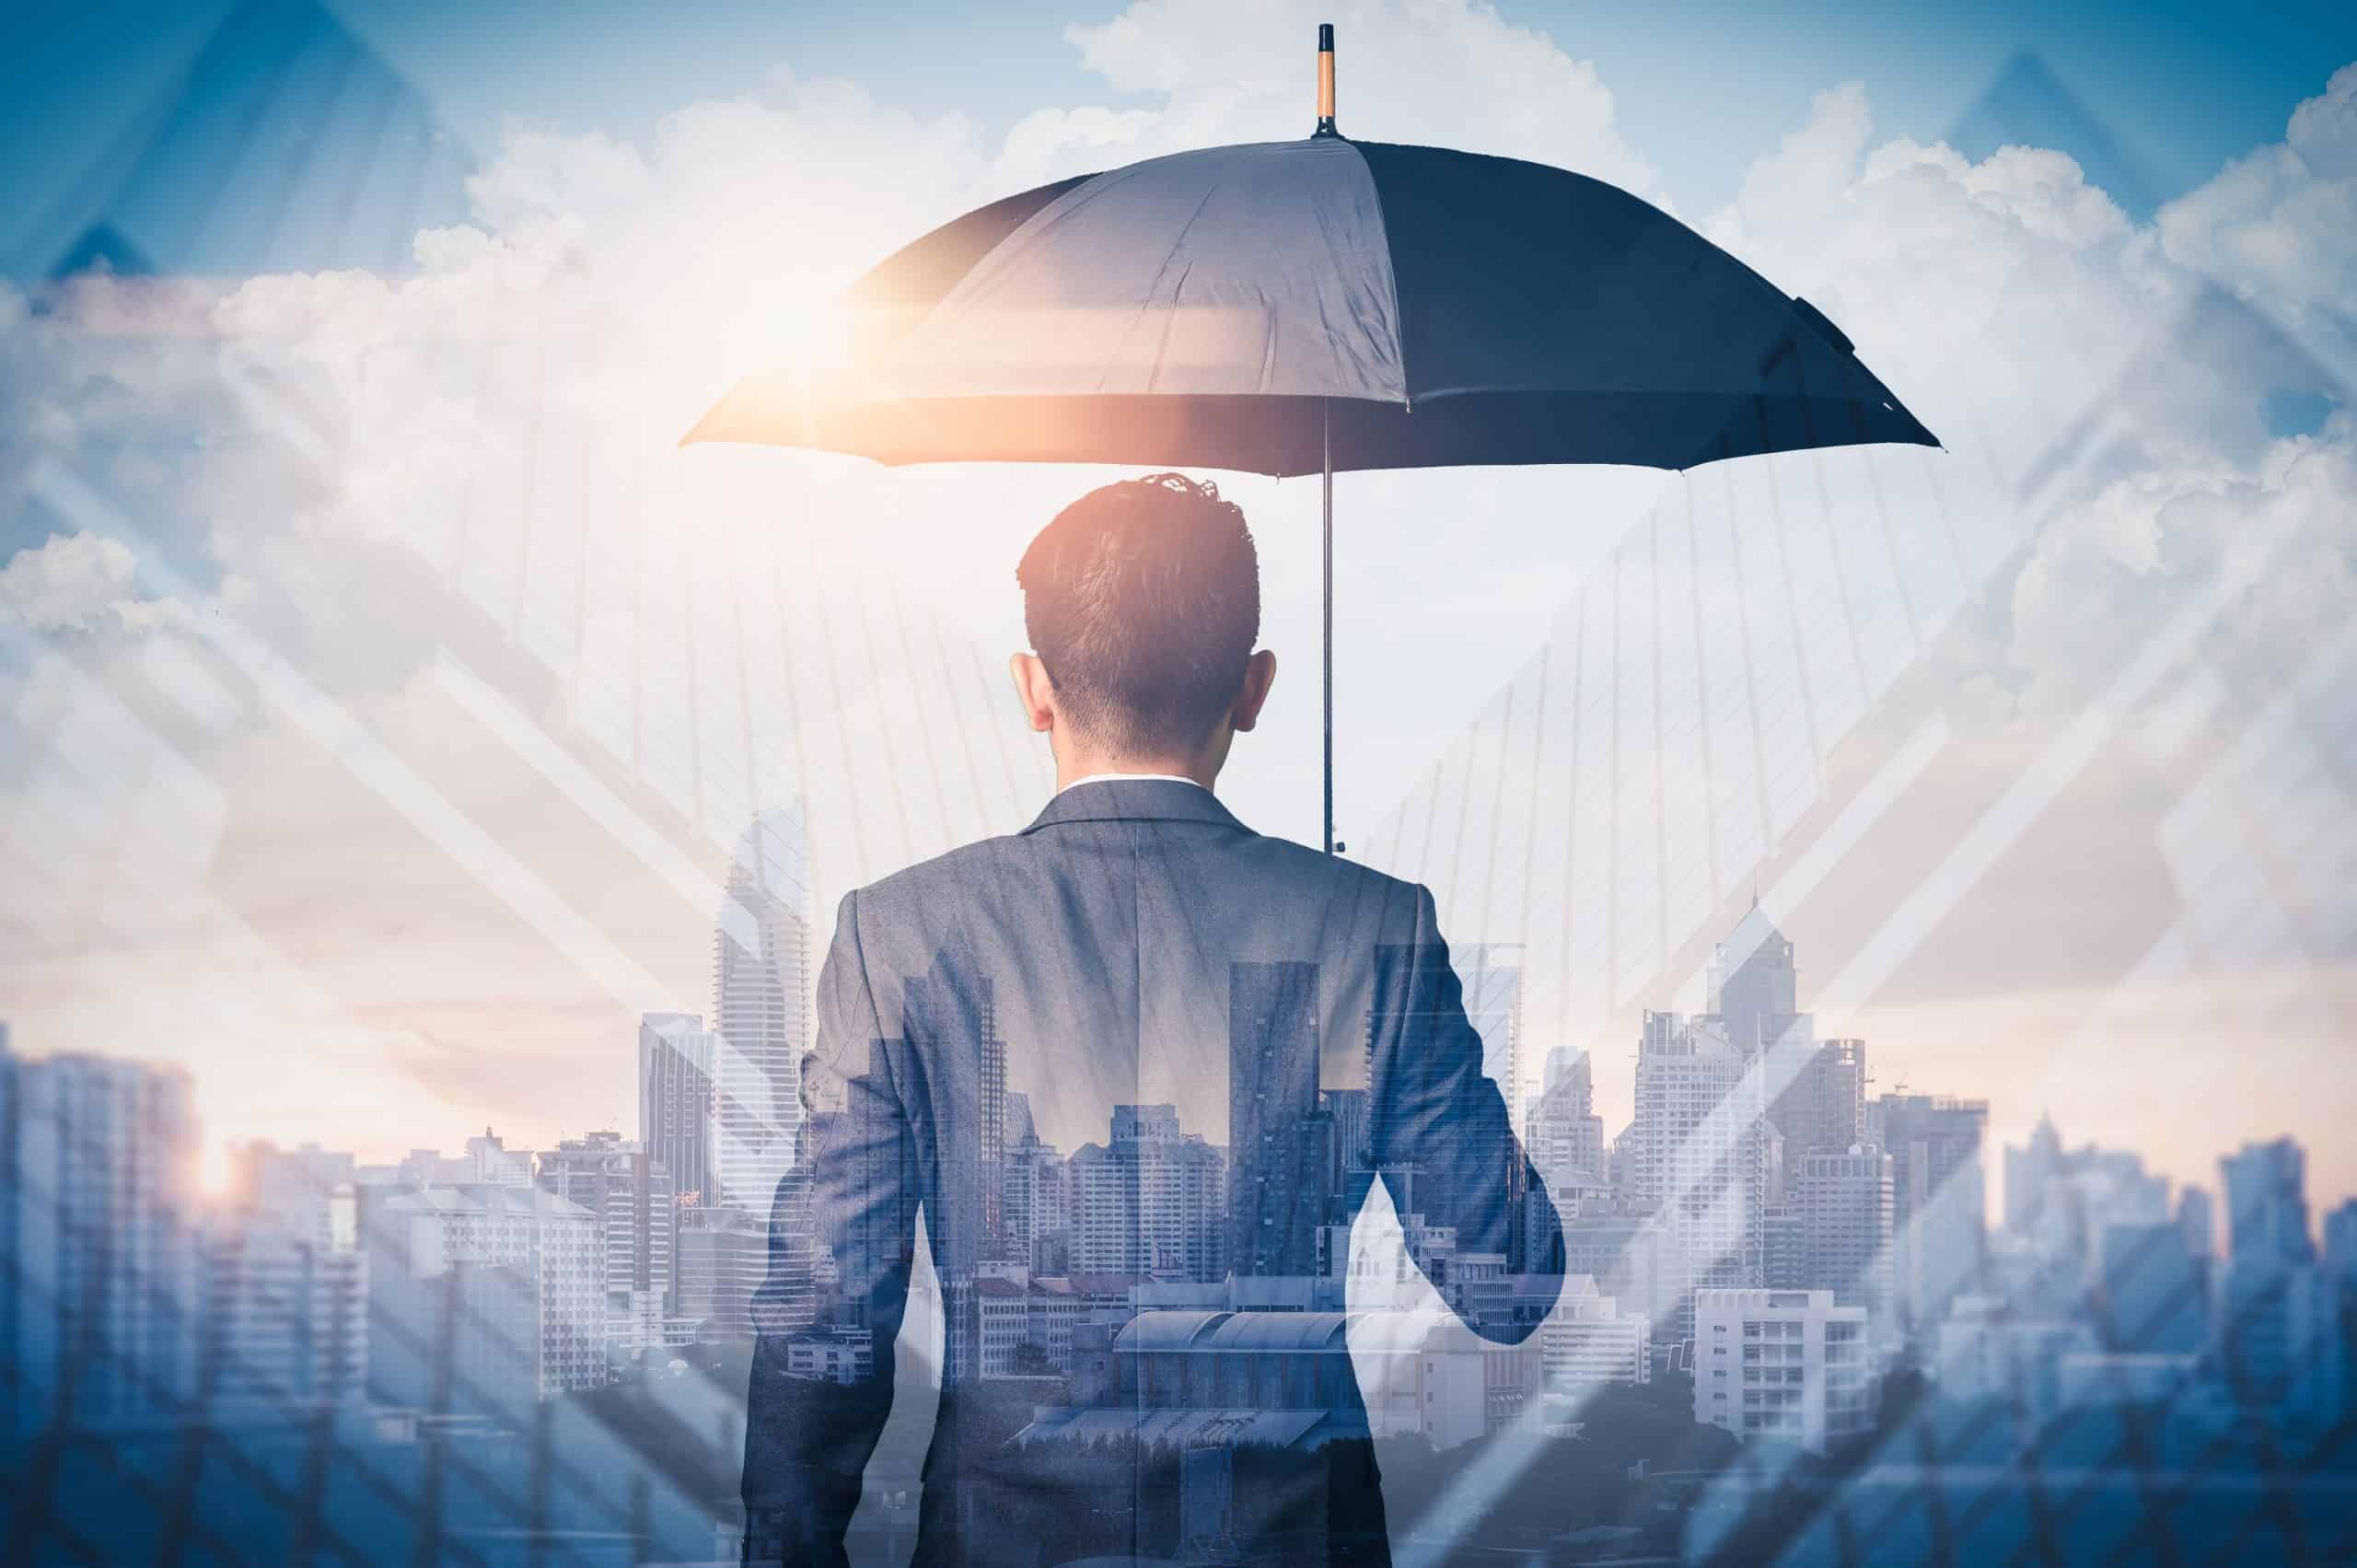 umbrella company contractor